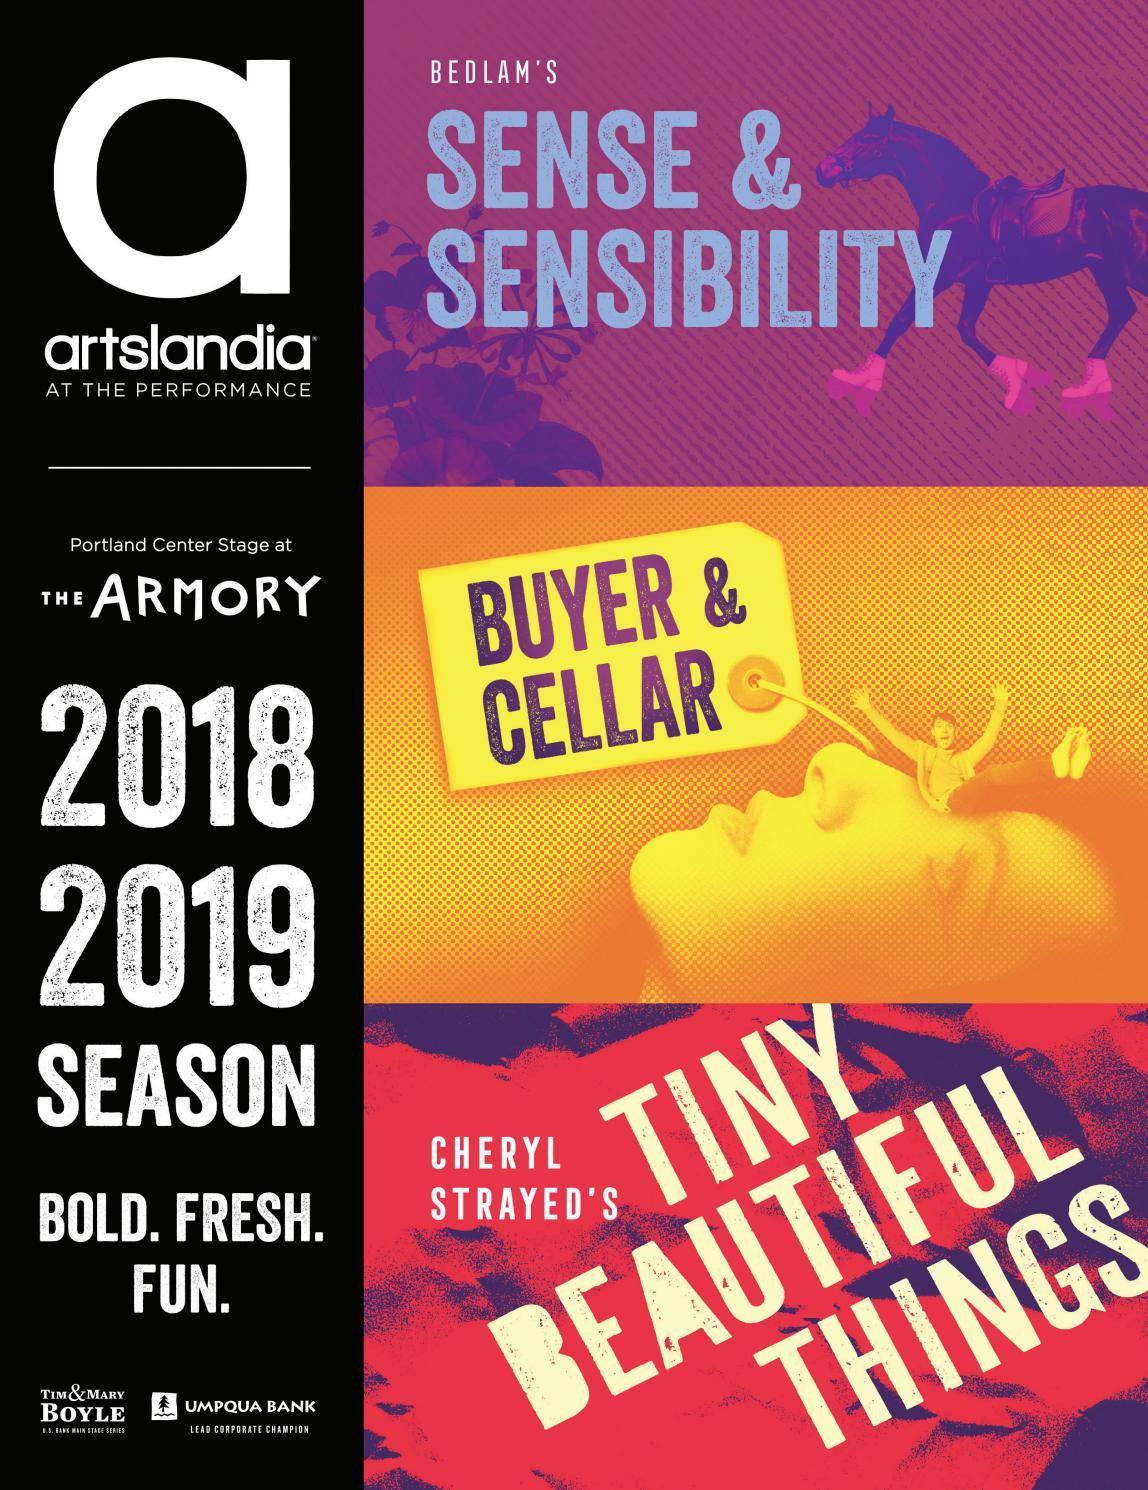 dfa325f0bf7 Sense   Sensibility   Buyer   Cellar   Tiny Beautiful Things - Portland  Center Stage at The Armory by Artslandia - issuu